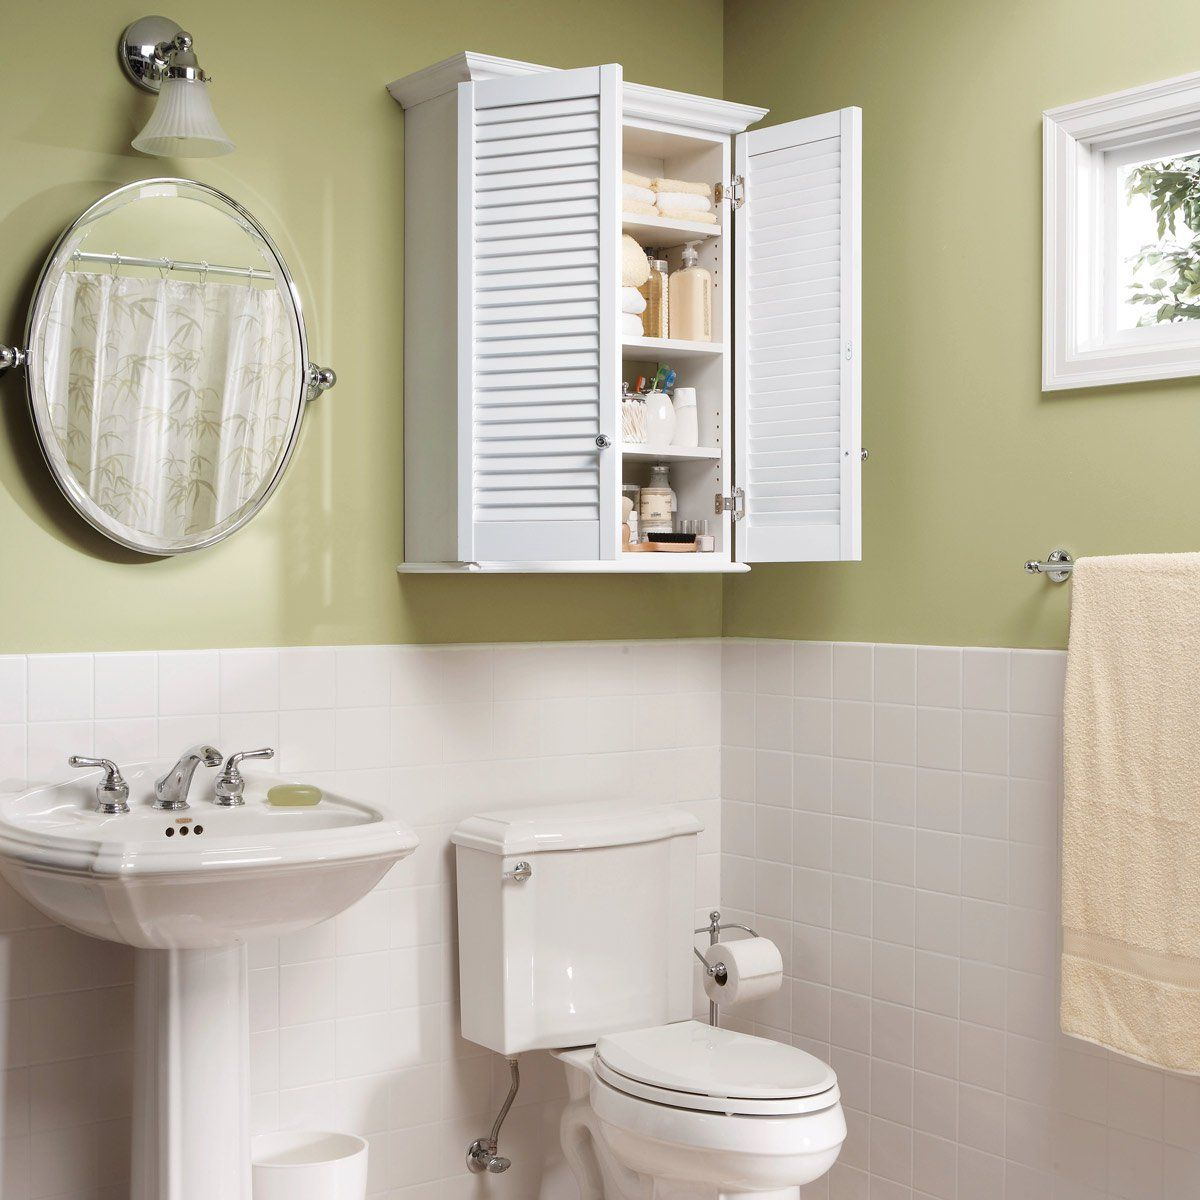 Make a Super-Simple Bath Cabinet | Simple bathroom, Bath ...